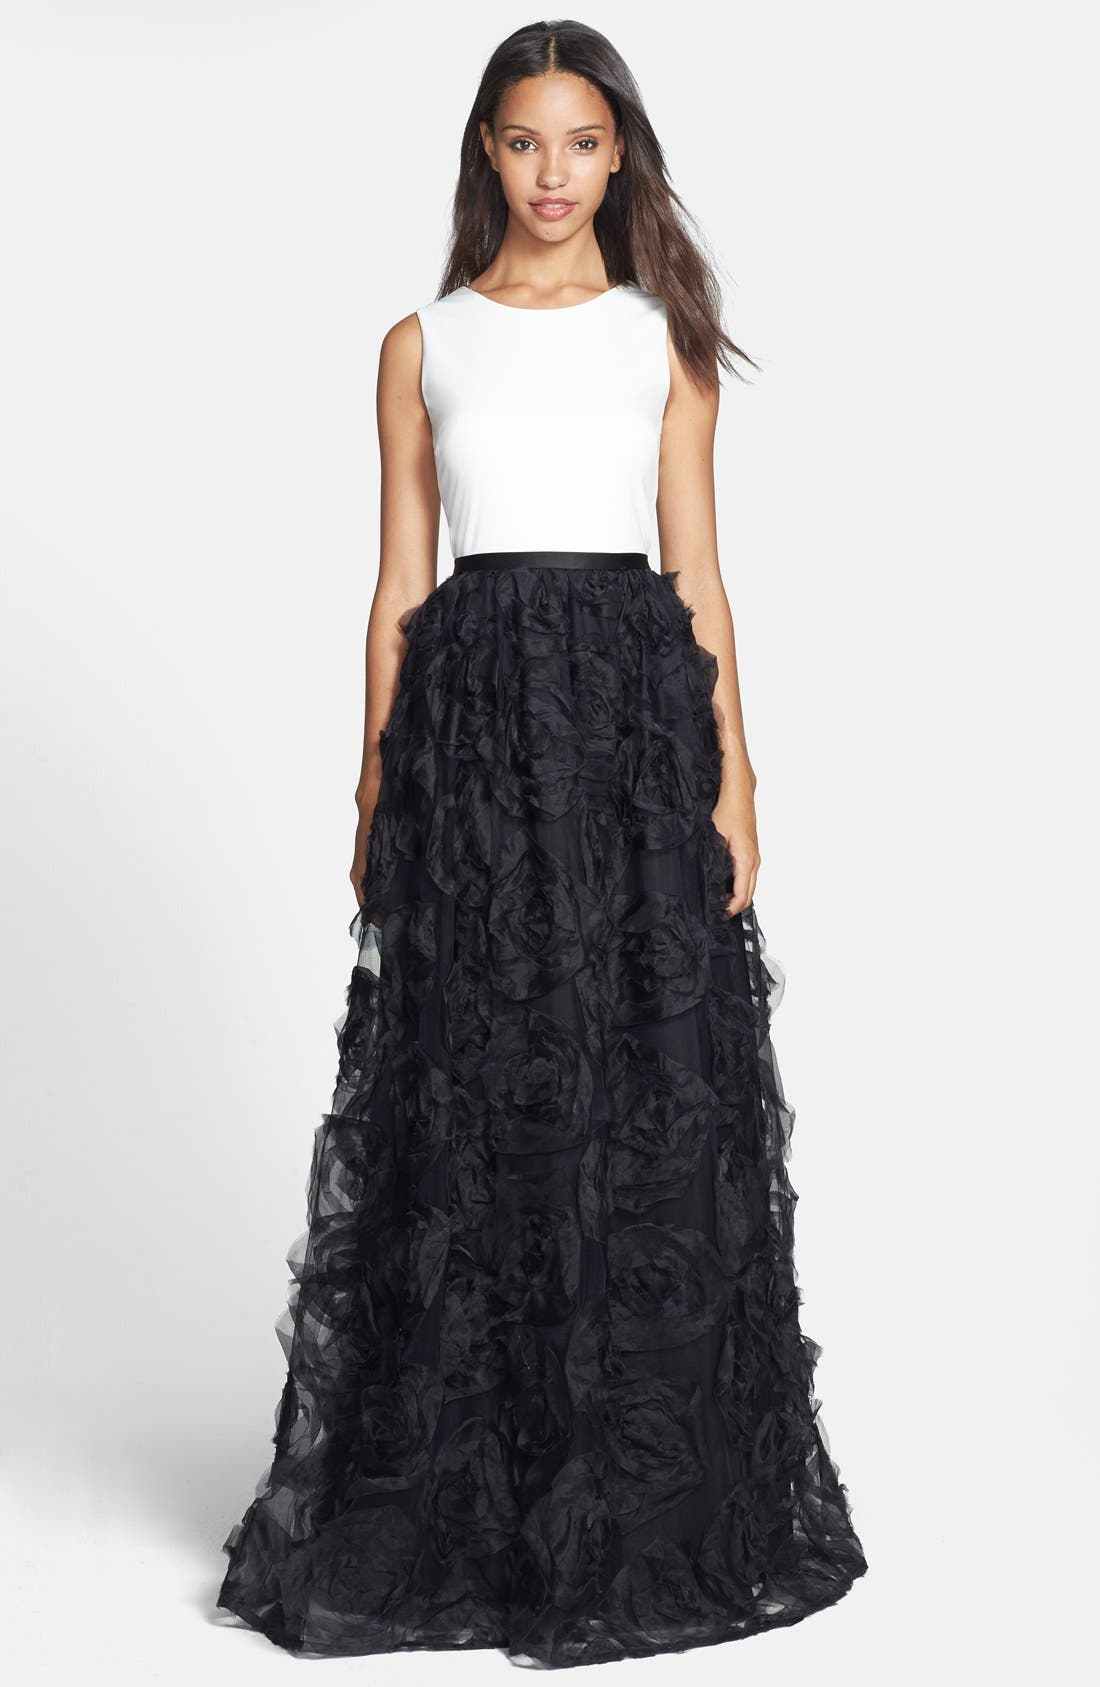 Main Image - Aidan Mattox Sleeveless Ruffle Skirt Ballgown